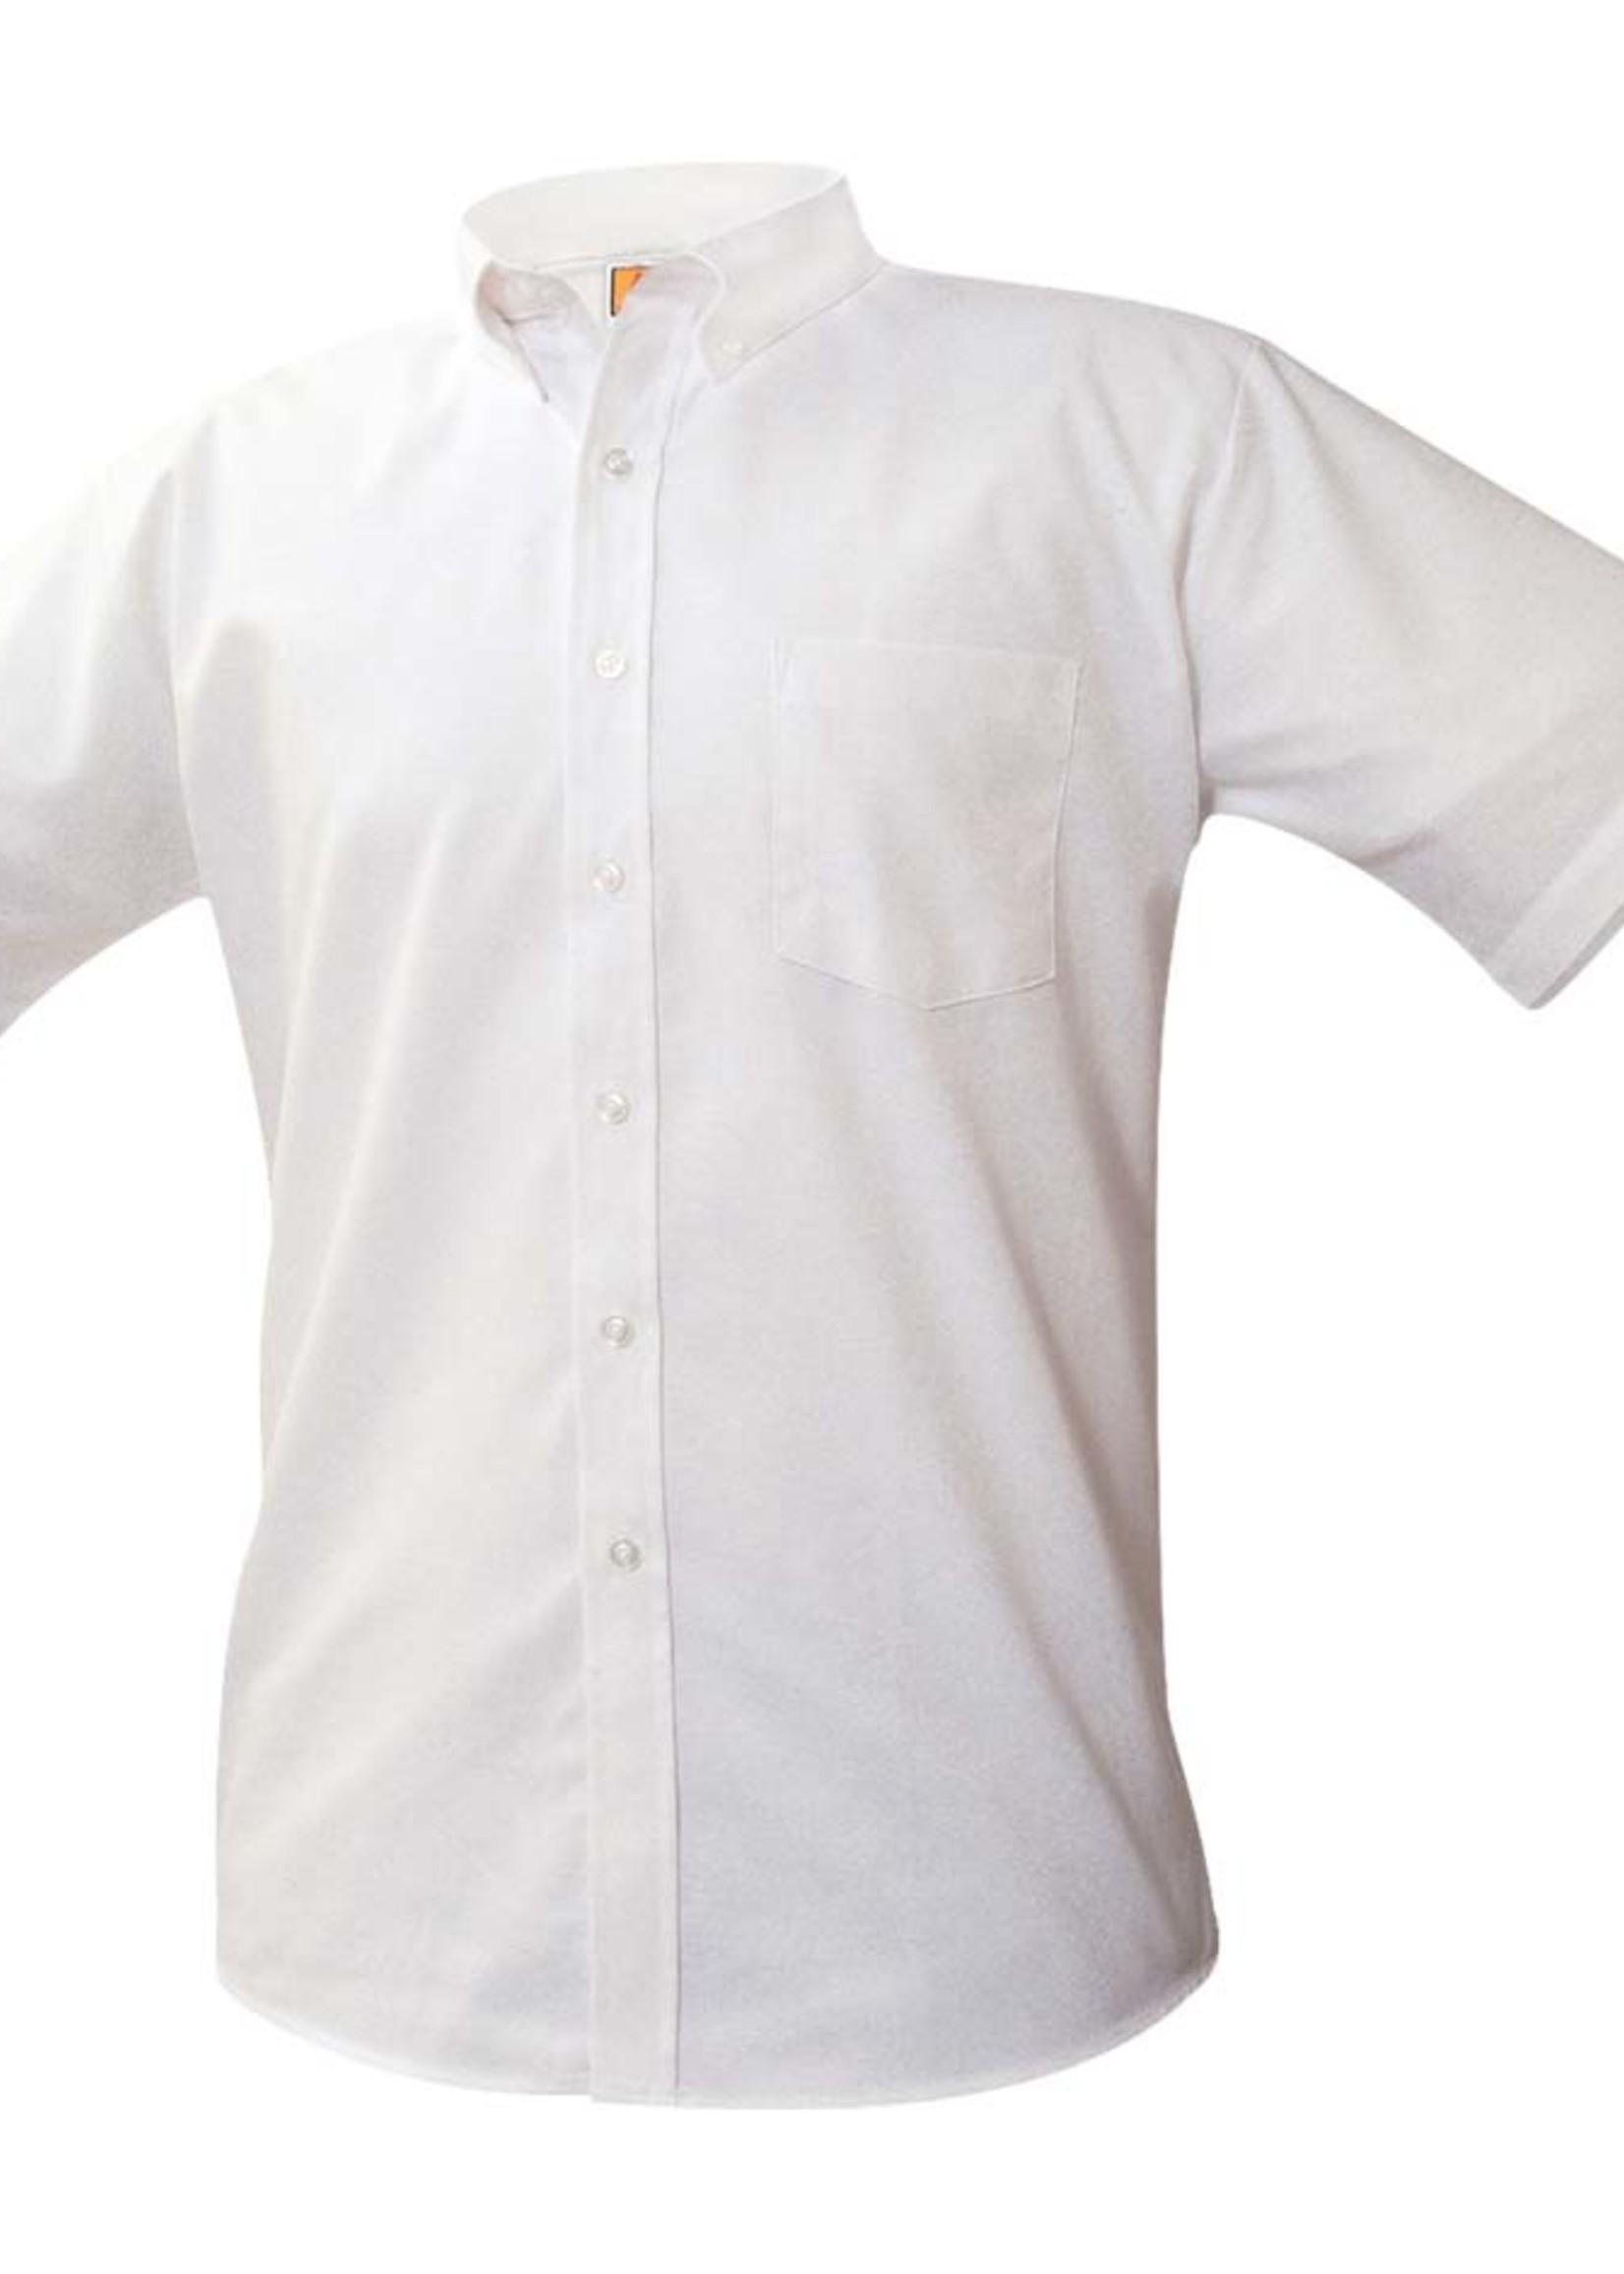 TUS JDA White Short Sleeve Oxford Shirt